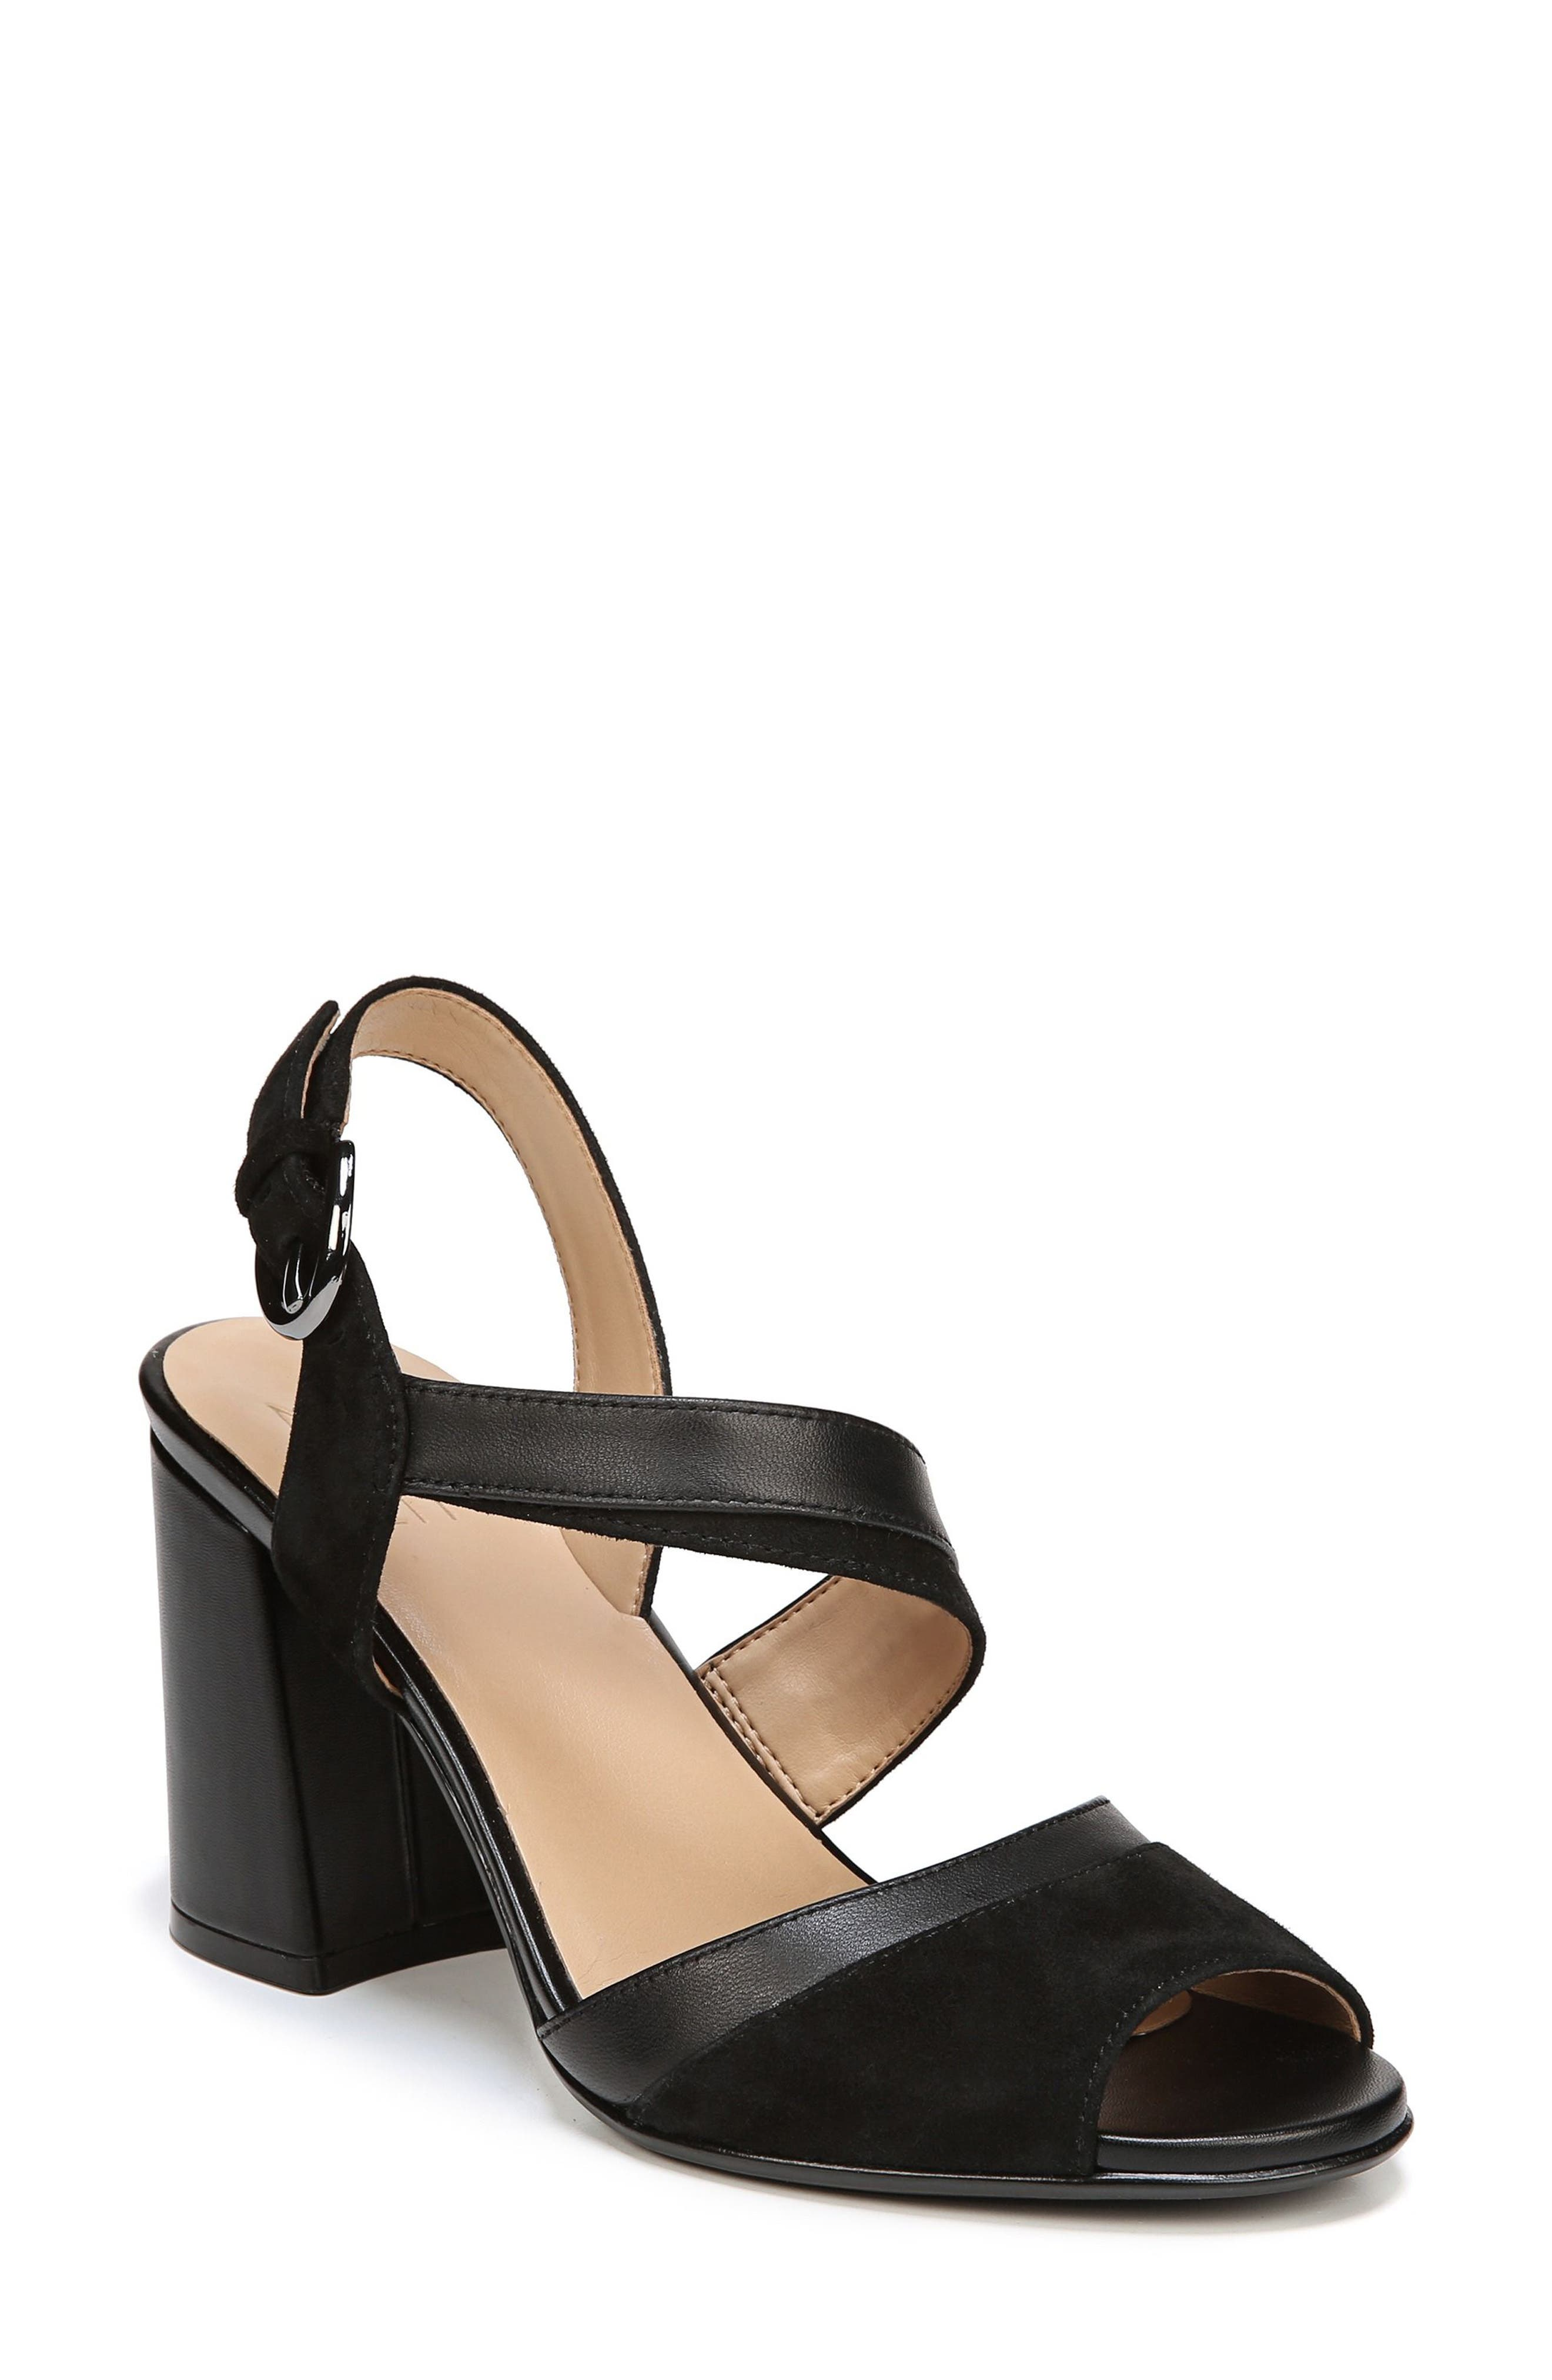 Terah Sandal,                         Main,                         color, BLACK SUEDE